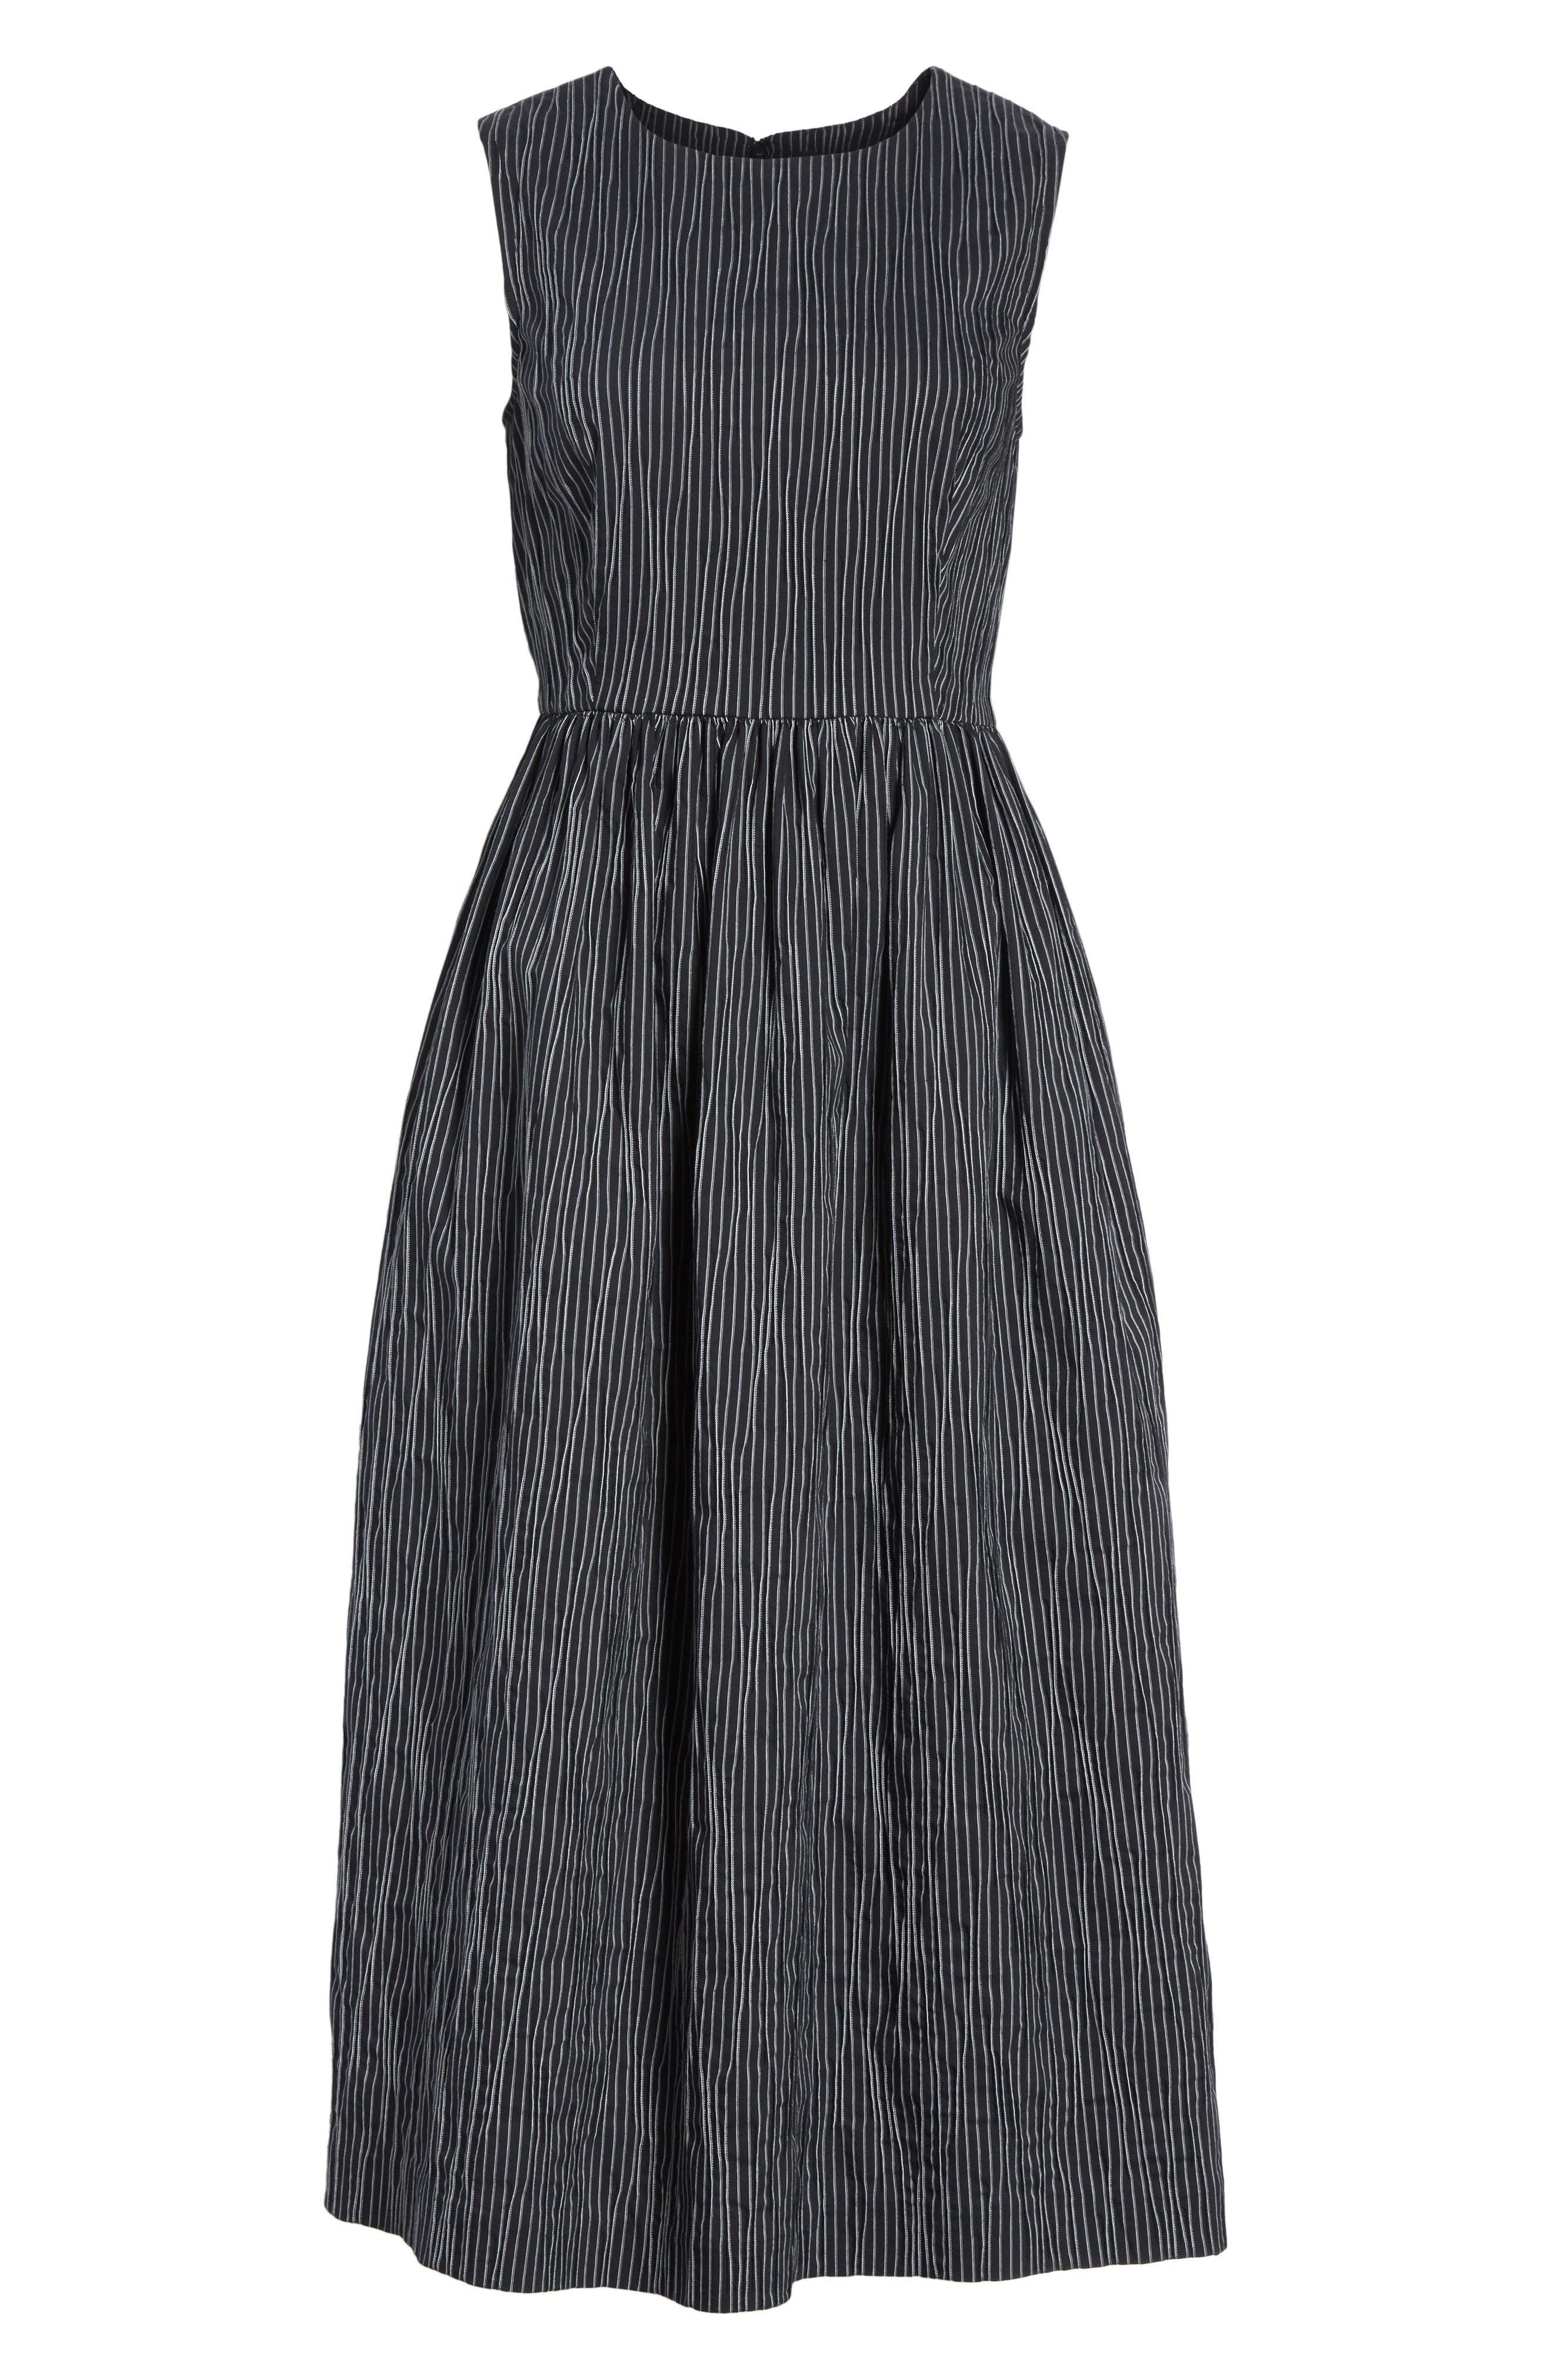 Stripe Crinkle Cotton Blend Midi Dress,                             Alternate thumbnail 6, color,                             010